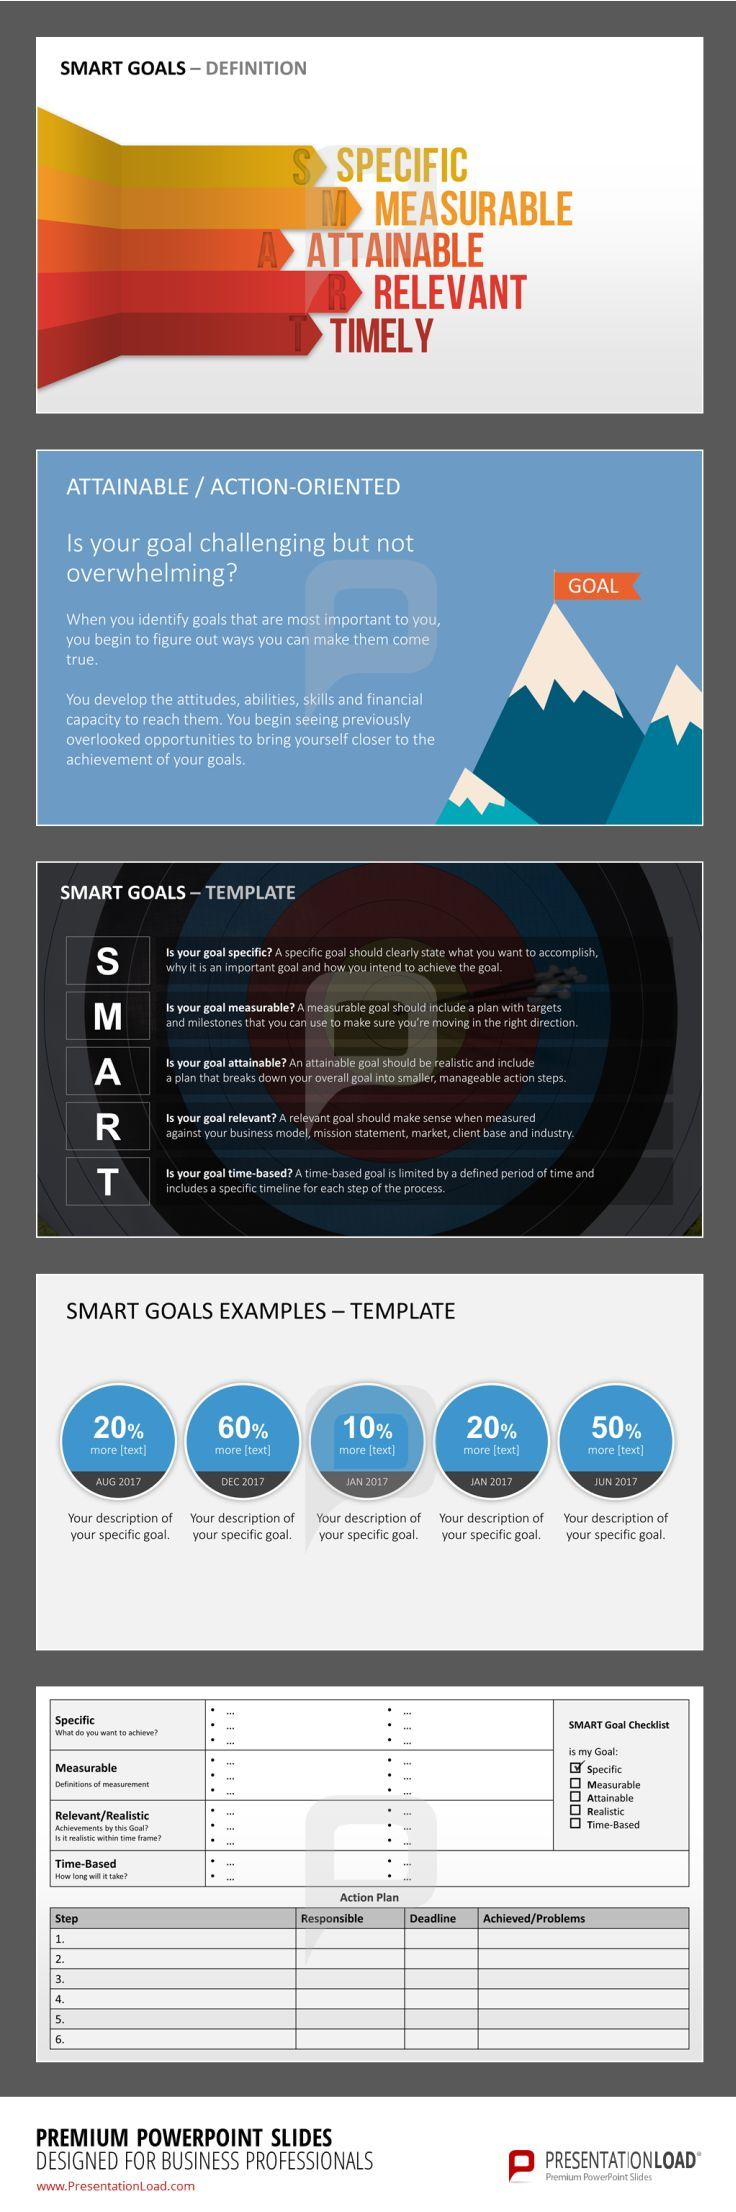 55 best SMART ZIELE // POWERPOINT images on Pinterest | Goal ...